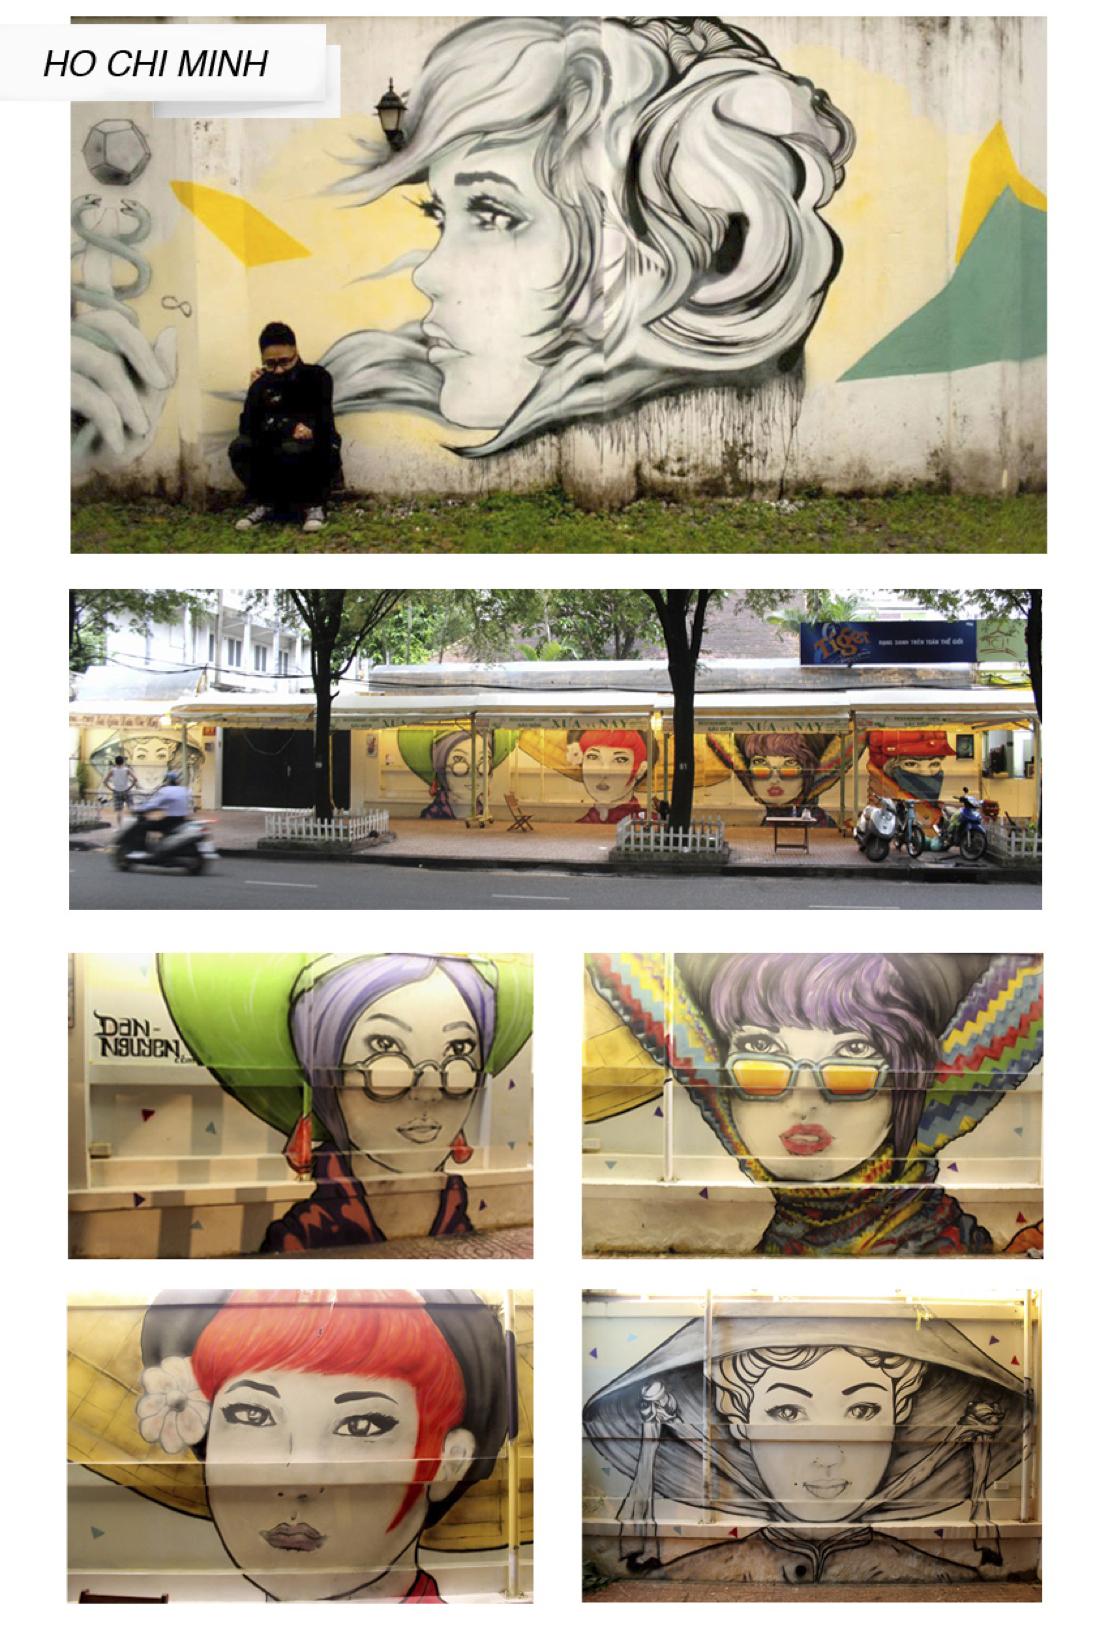 rgb_vn_Dan_Nguyen-art-13-hcm